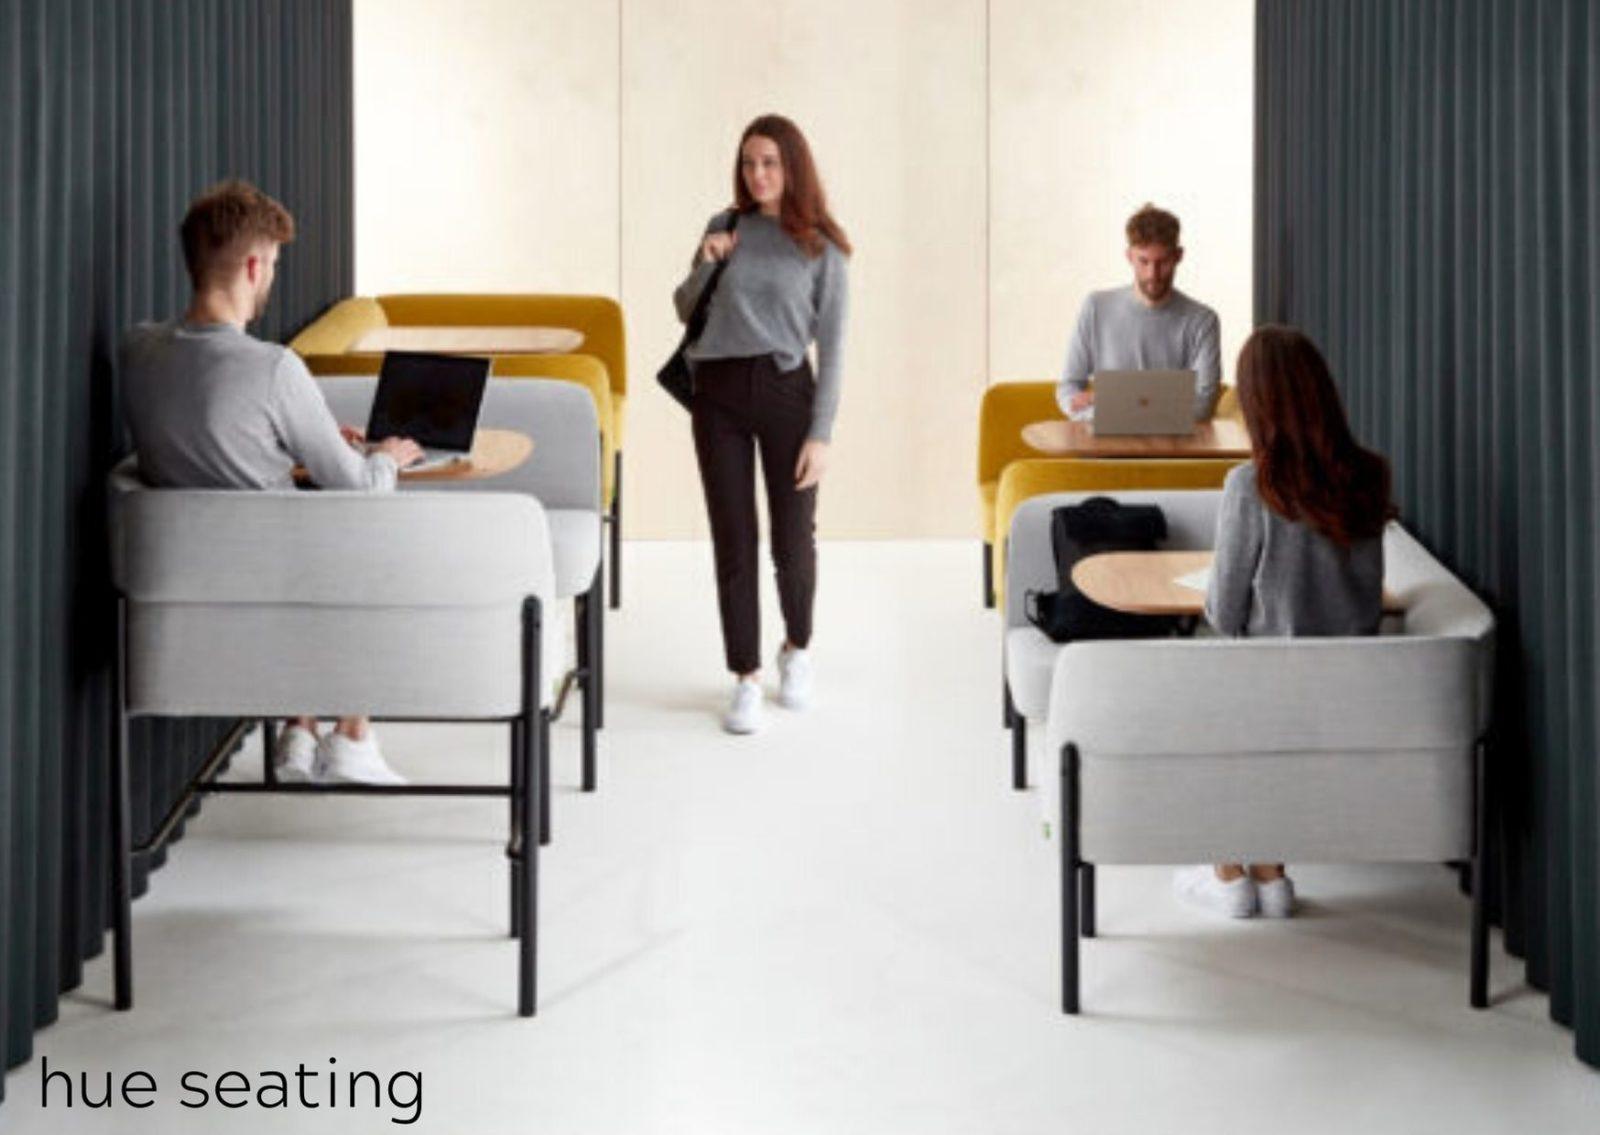 Pullman grey adjustable booths